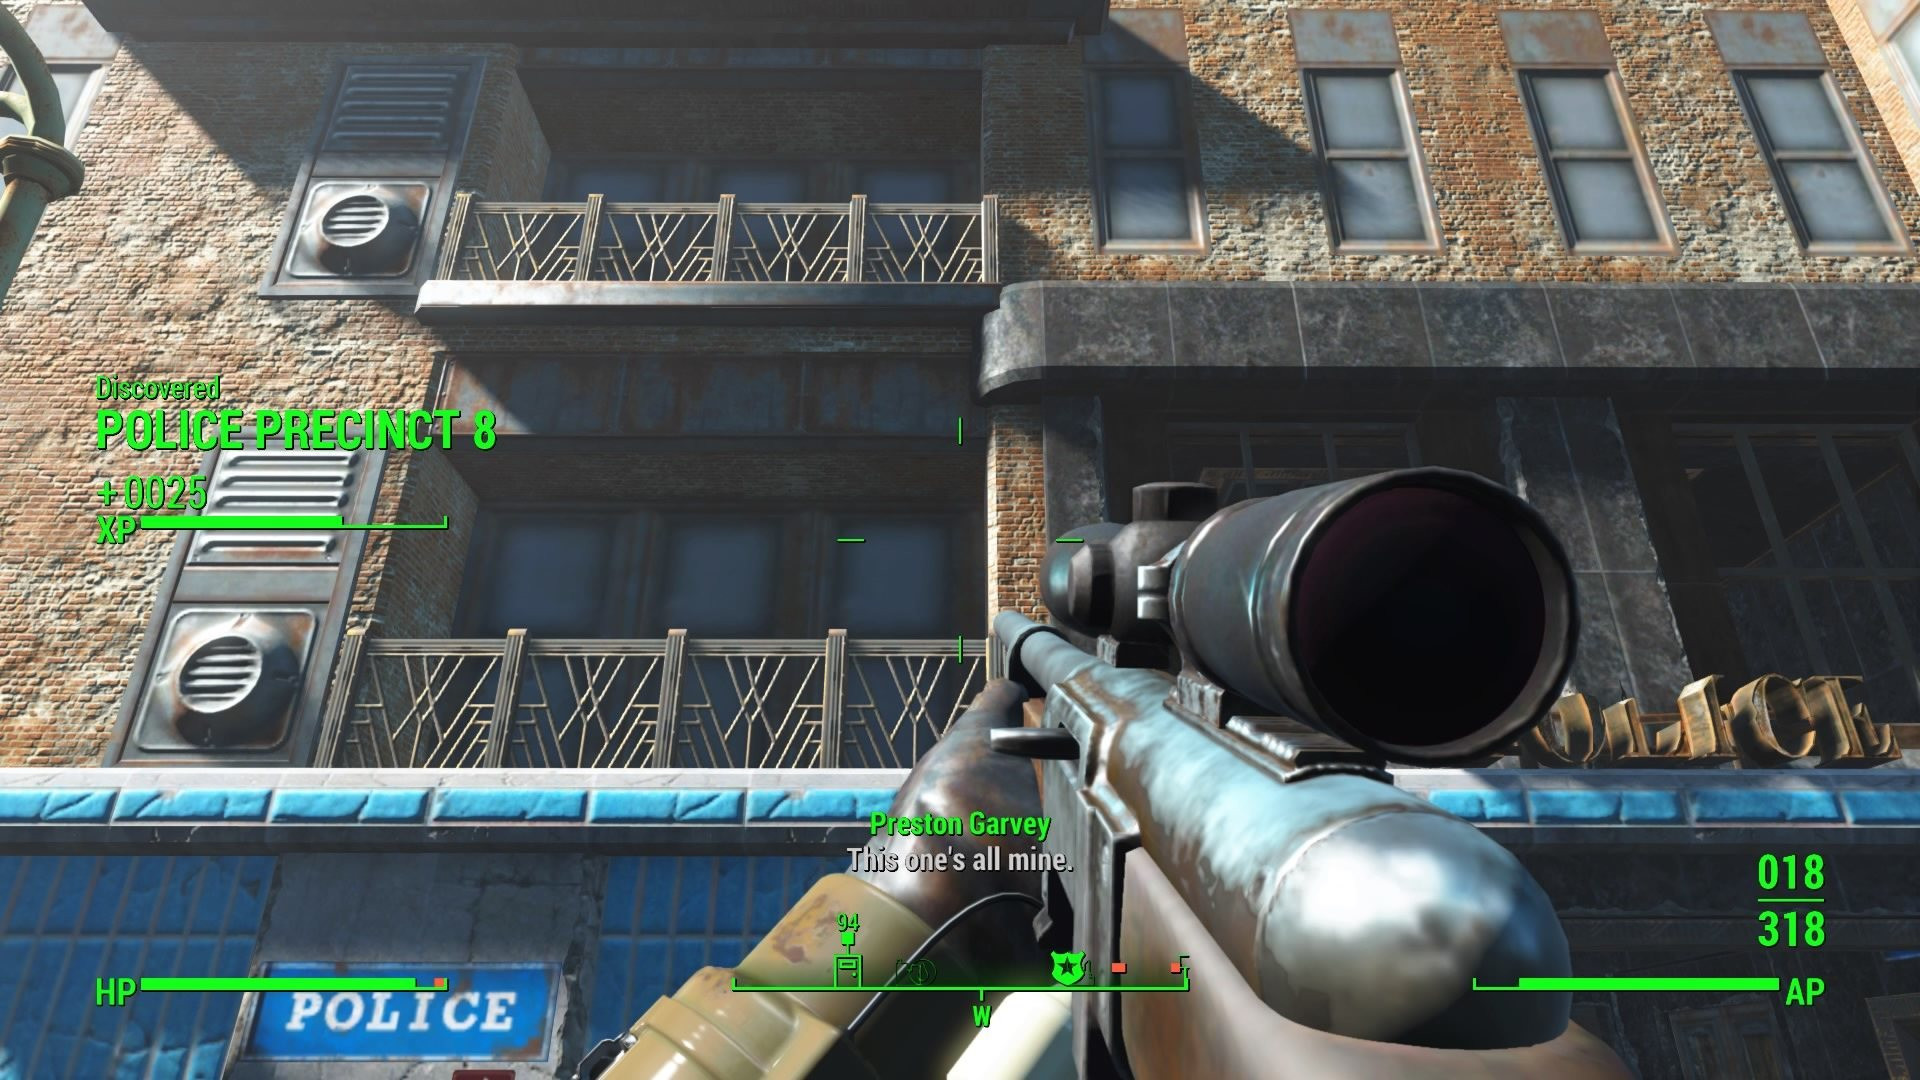 Fallout 4 Mean Pastries  Police Precinct 8